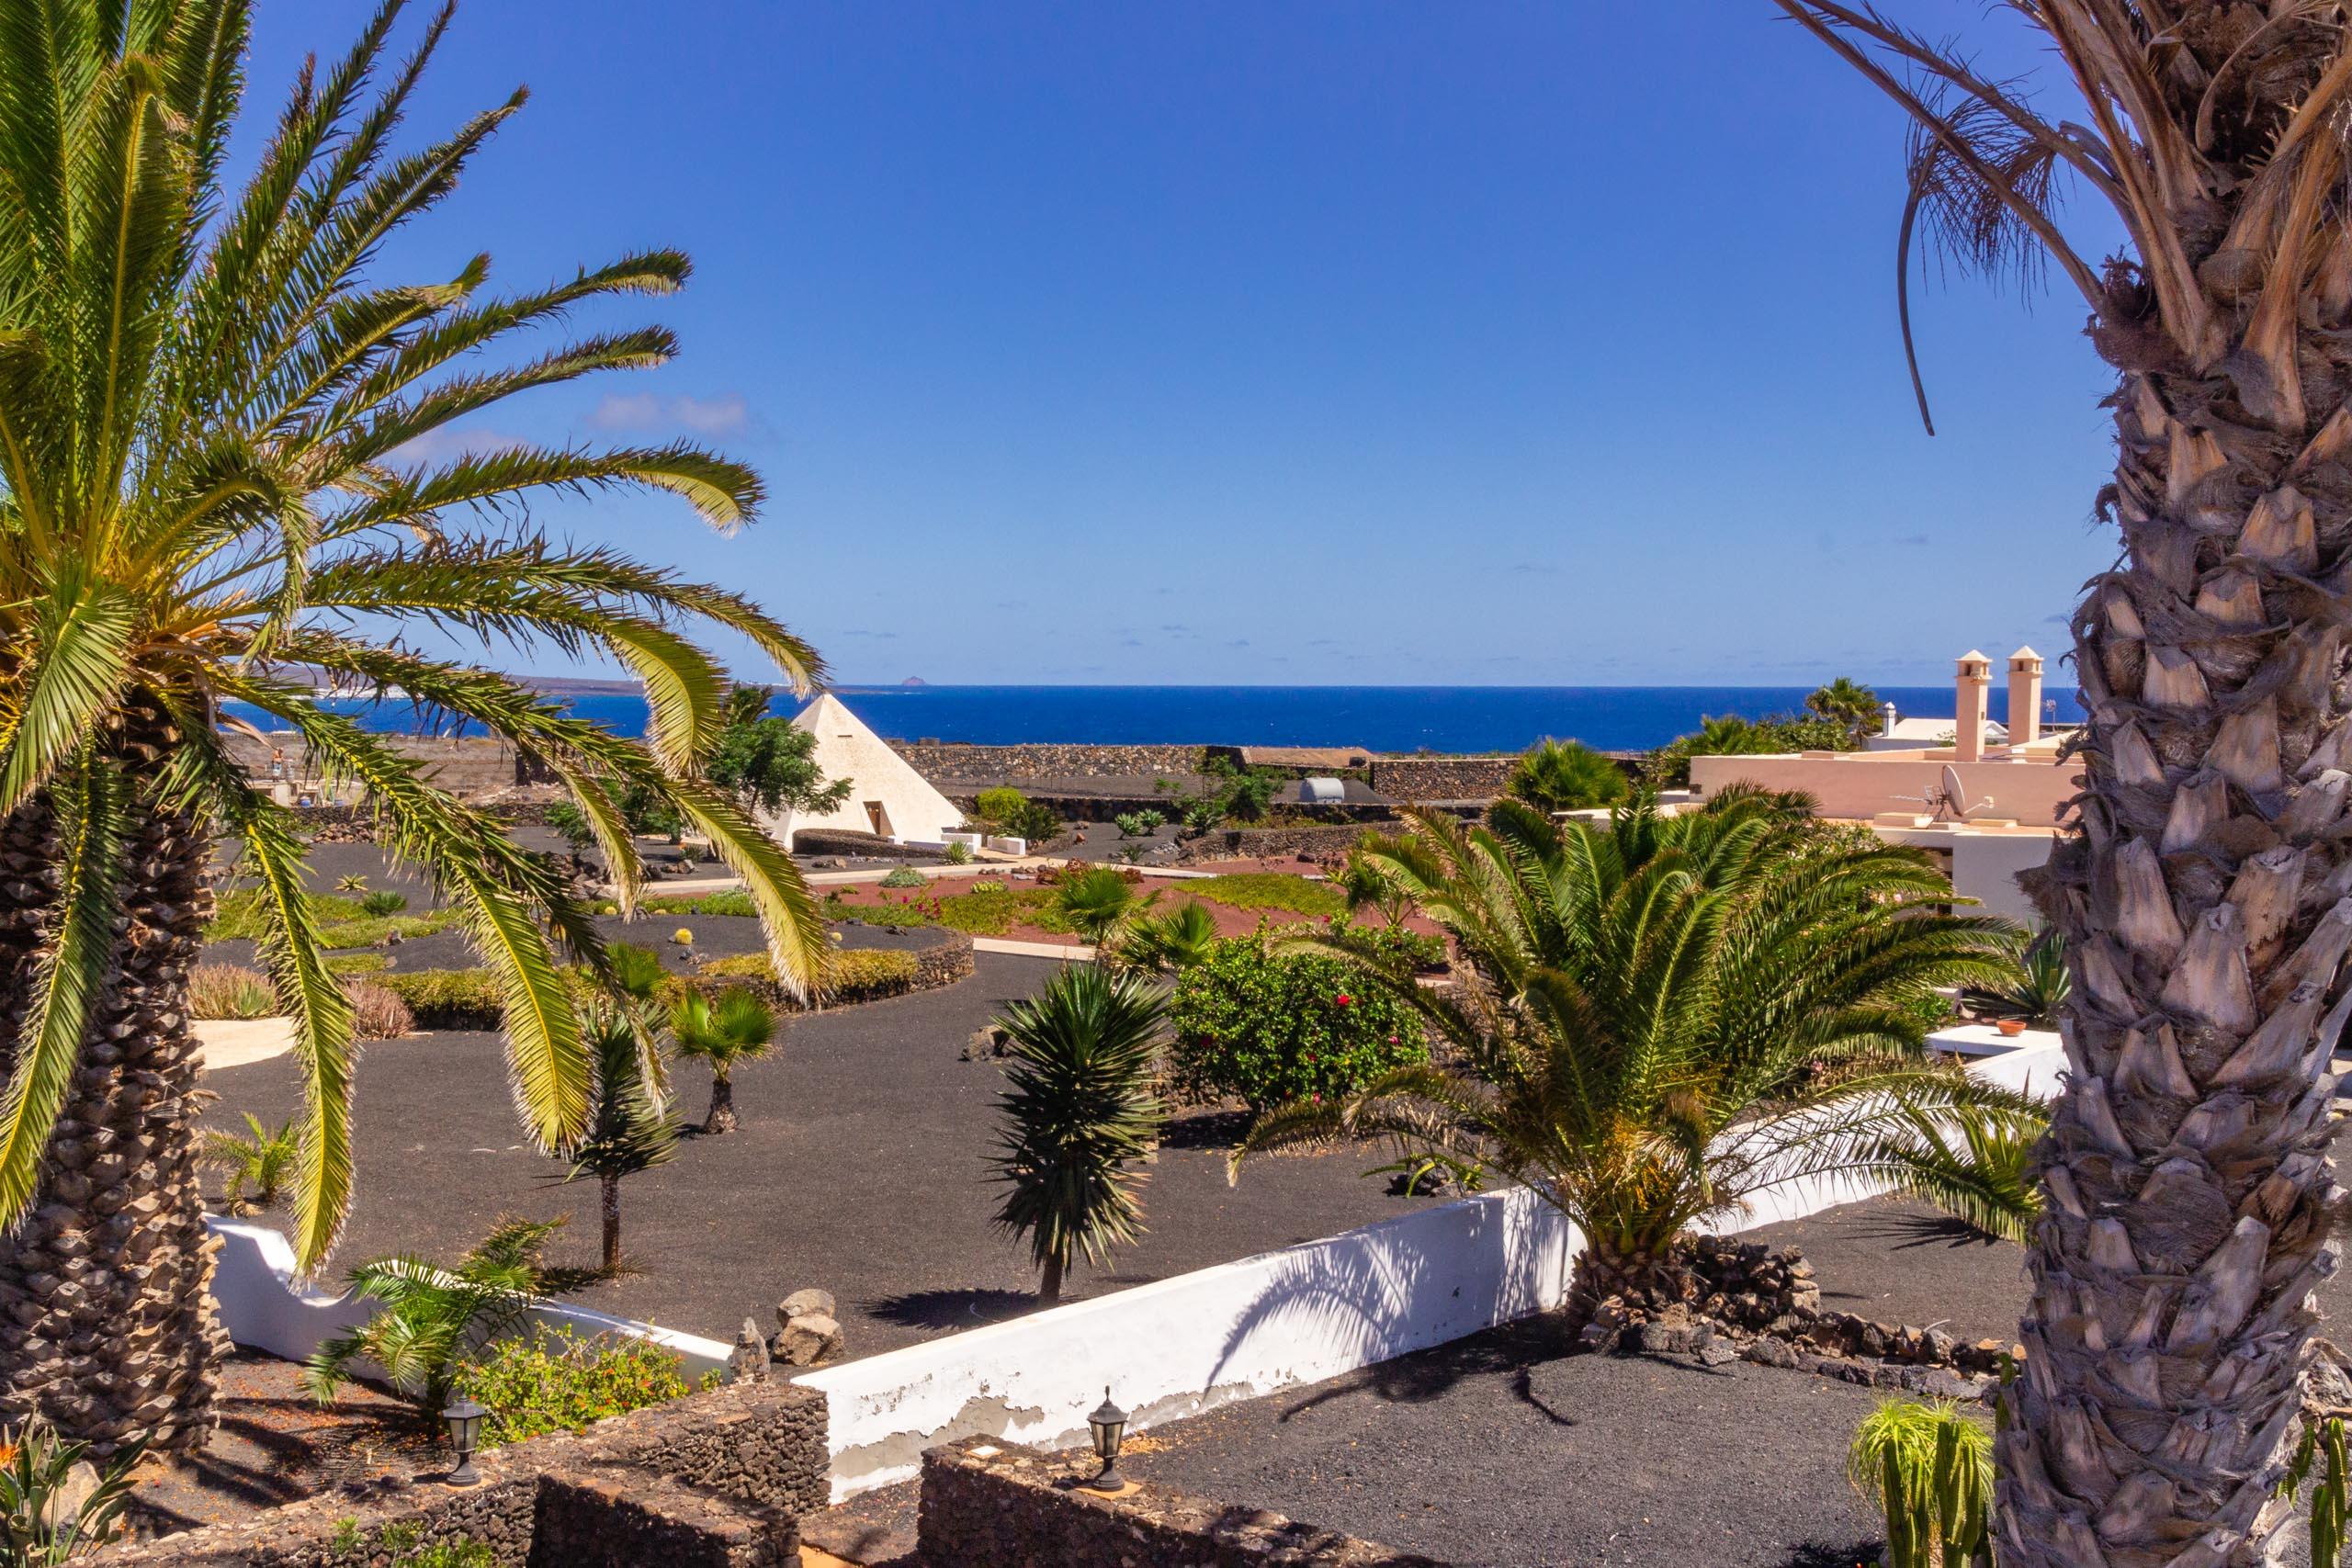 2016 09 Lanzarote GardenNeighbourhood 2 005